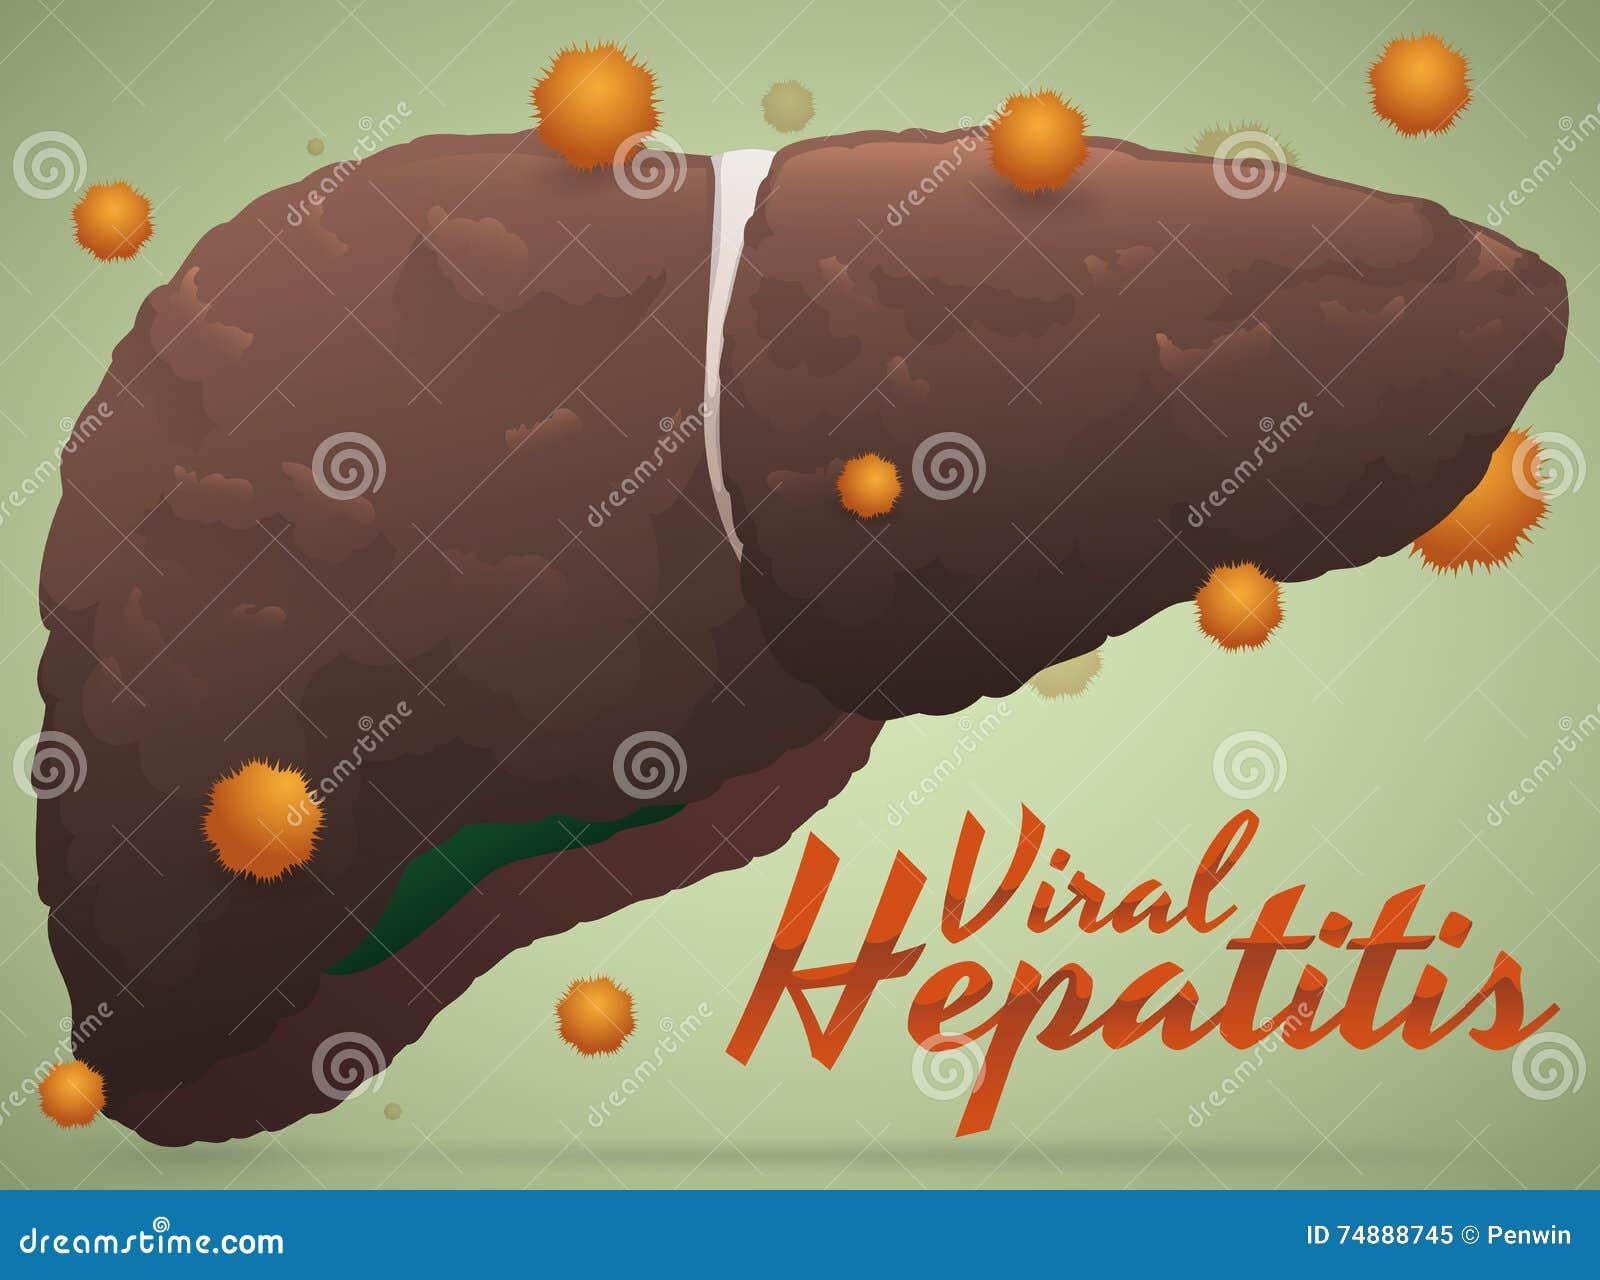 Sjukt leverresultat av virus- hepatit med viruset runt om den, vektorillustration